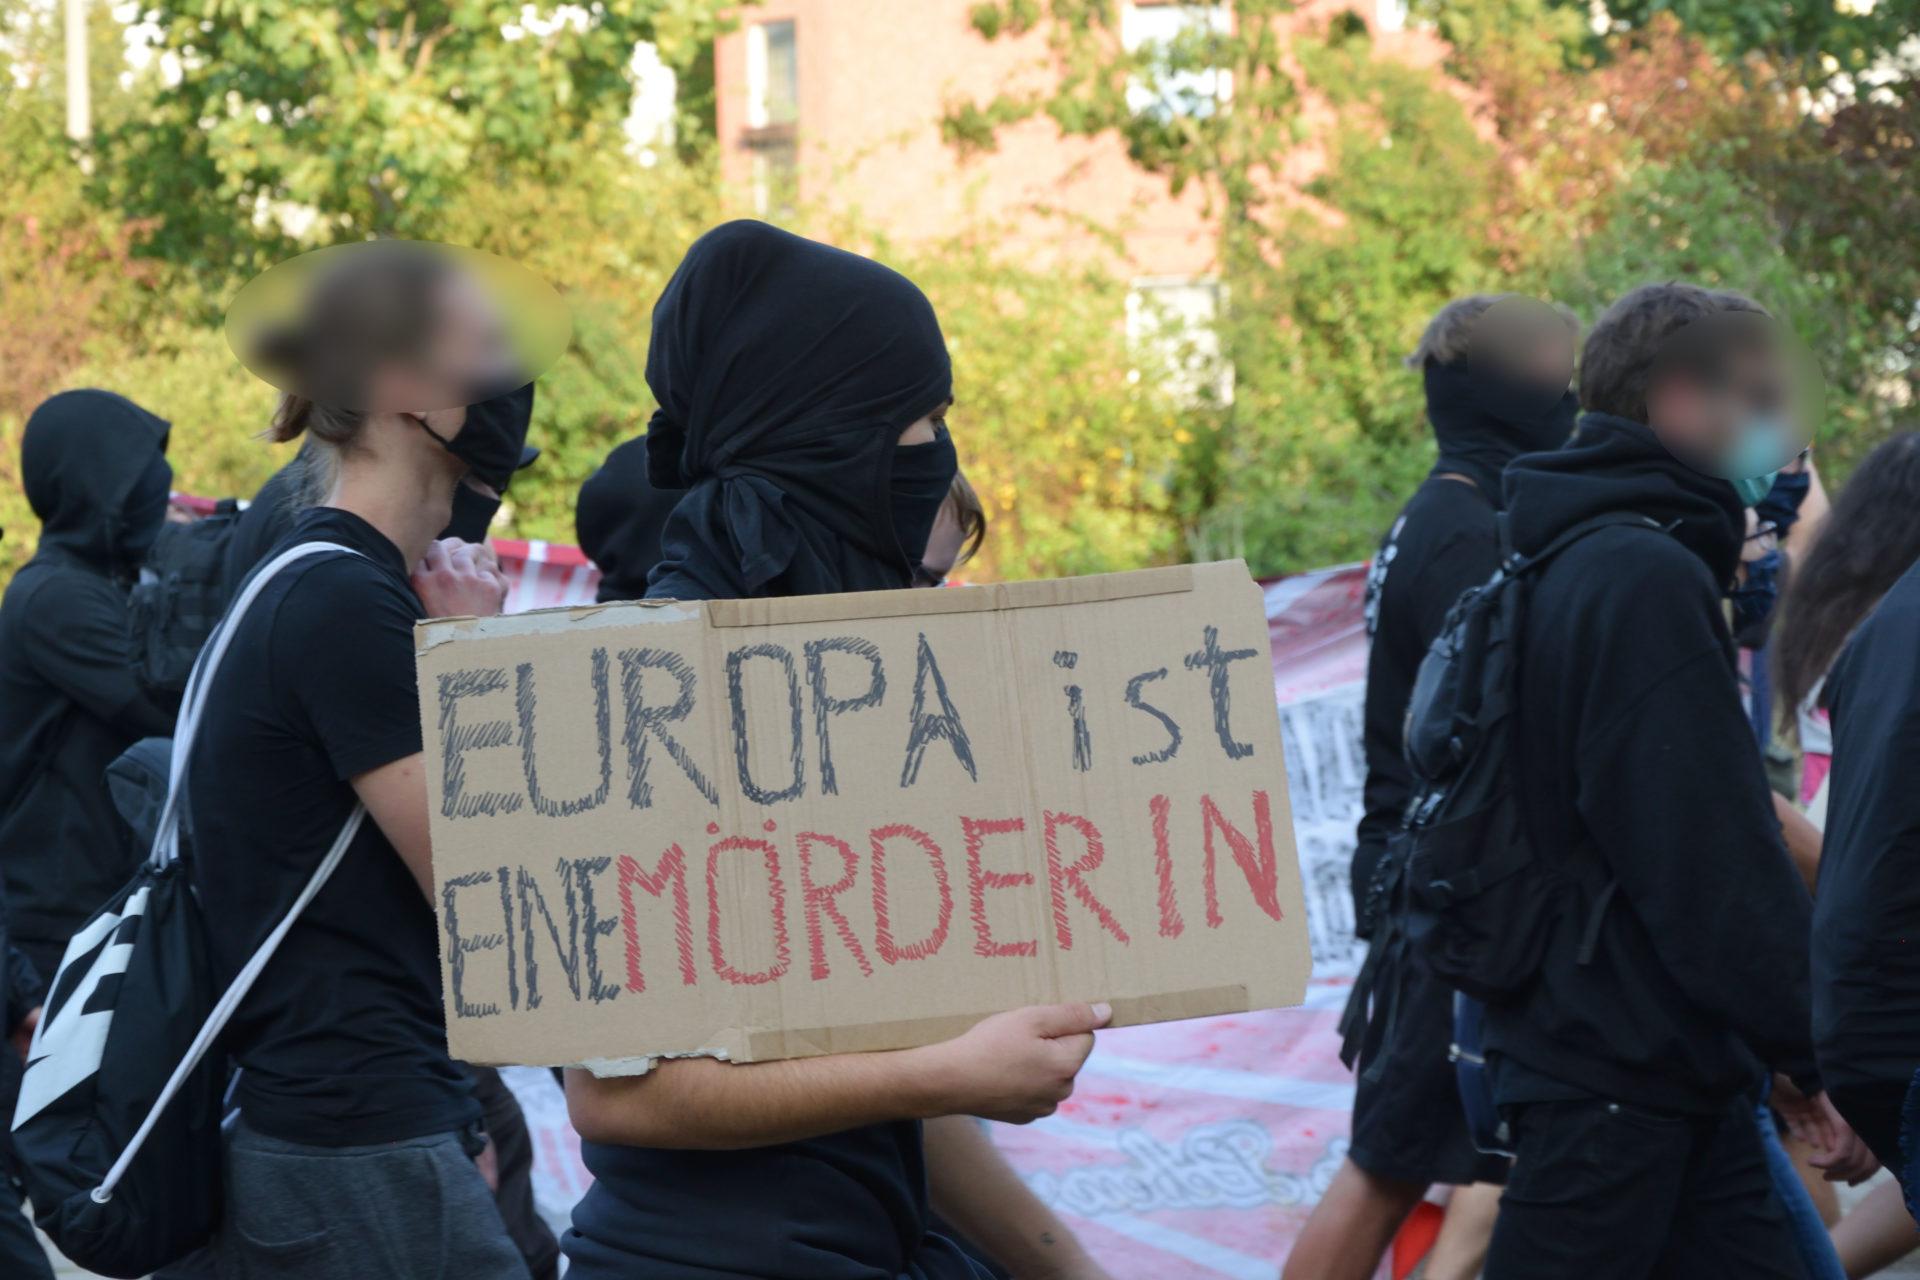 Antiautoritäre Demonstration in Leipzig: Solidarität mit Hongkong und Kritik an der Grenzpolitik der EU